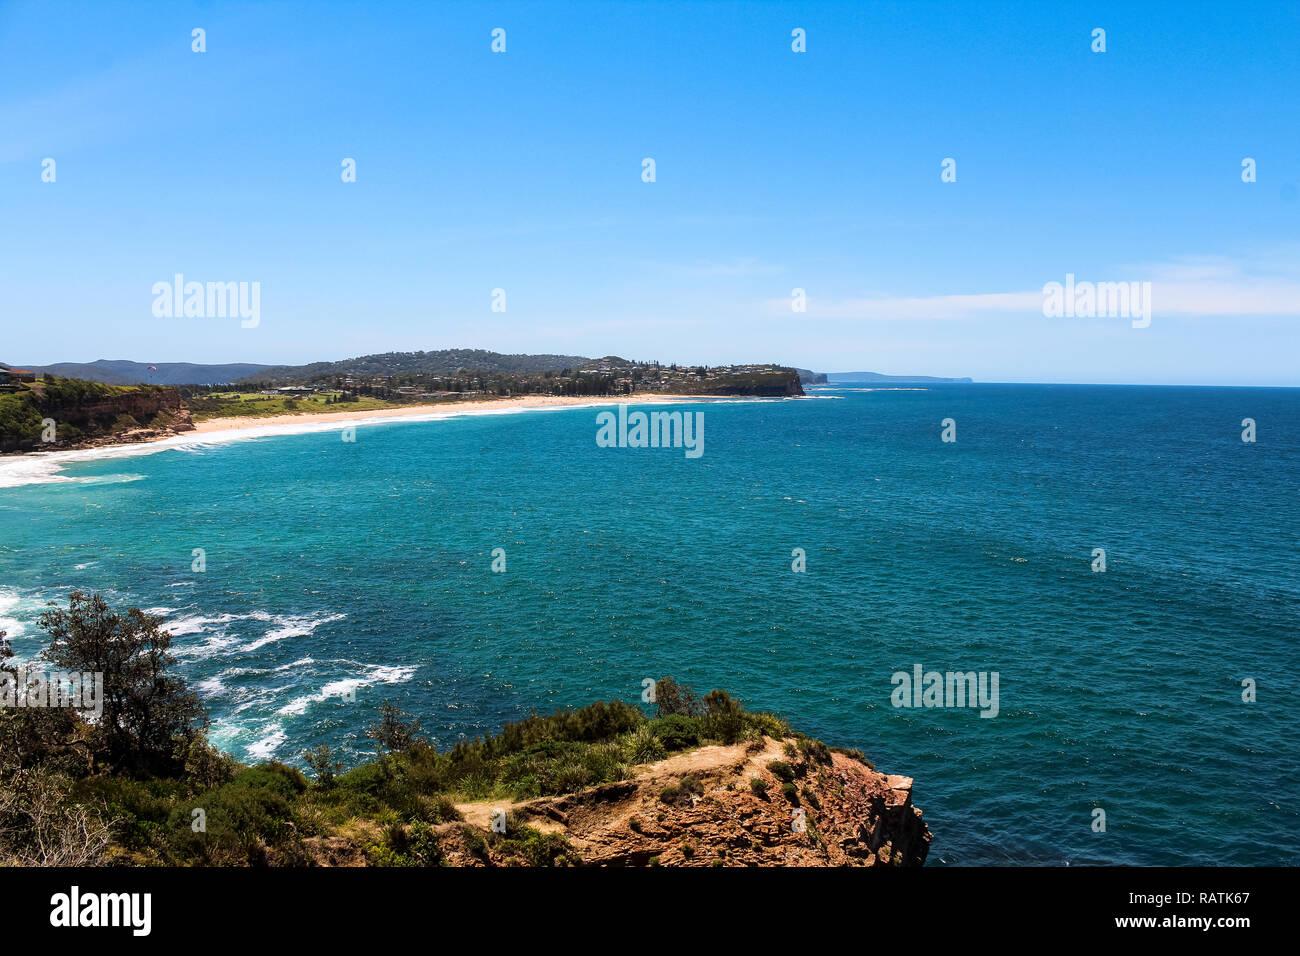 Turimetta Head Viewpoint looking towards Mona Vale Beach, one of Sydney's Northern beaches on a cloud-free summer day (Sydney, Australia) - Stock Image